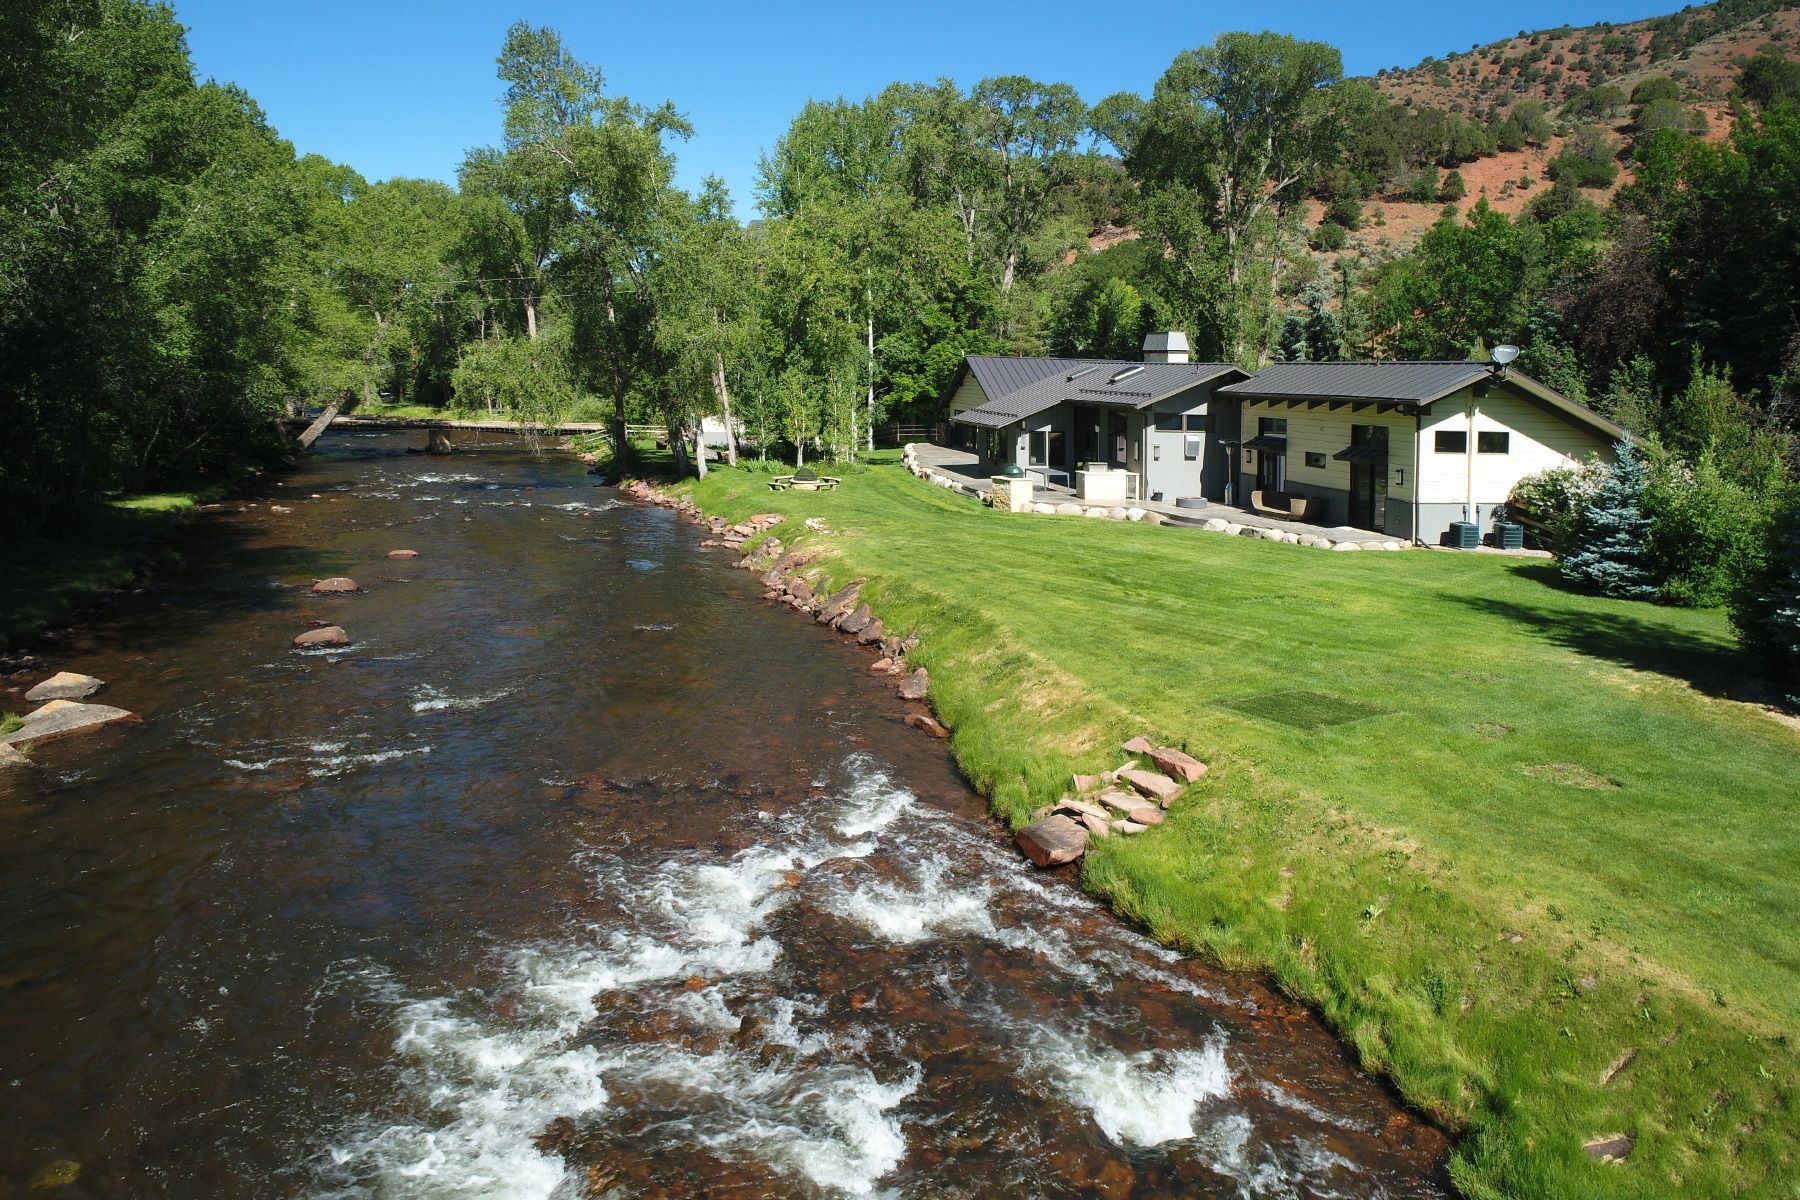 獨棟家庭住宅 為 出售 在 River Front Ranch in Peachblow 7800 Frying Pan Road Basalt, 科羅拉多州, 81621 美國